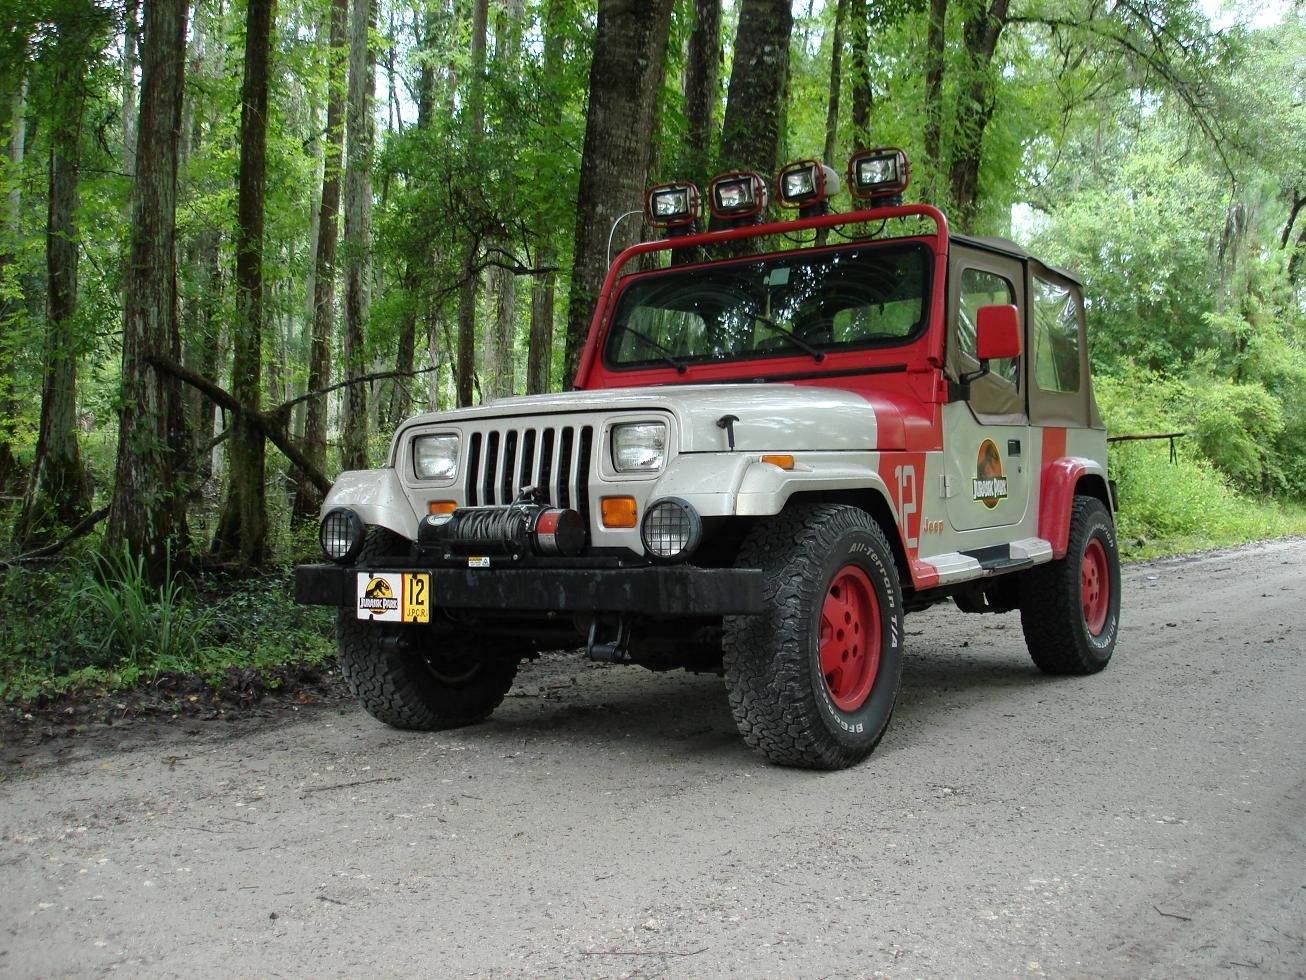 reference: jeep wrangler guide | jurassic park motor pool